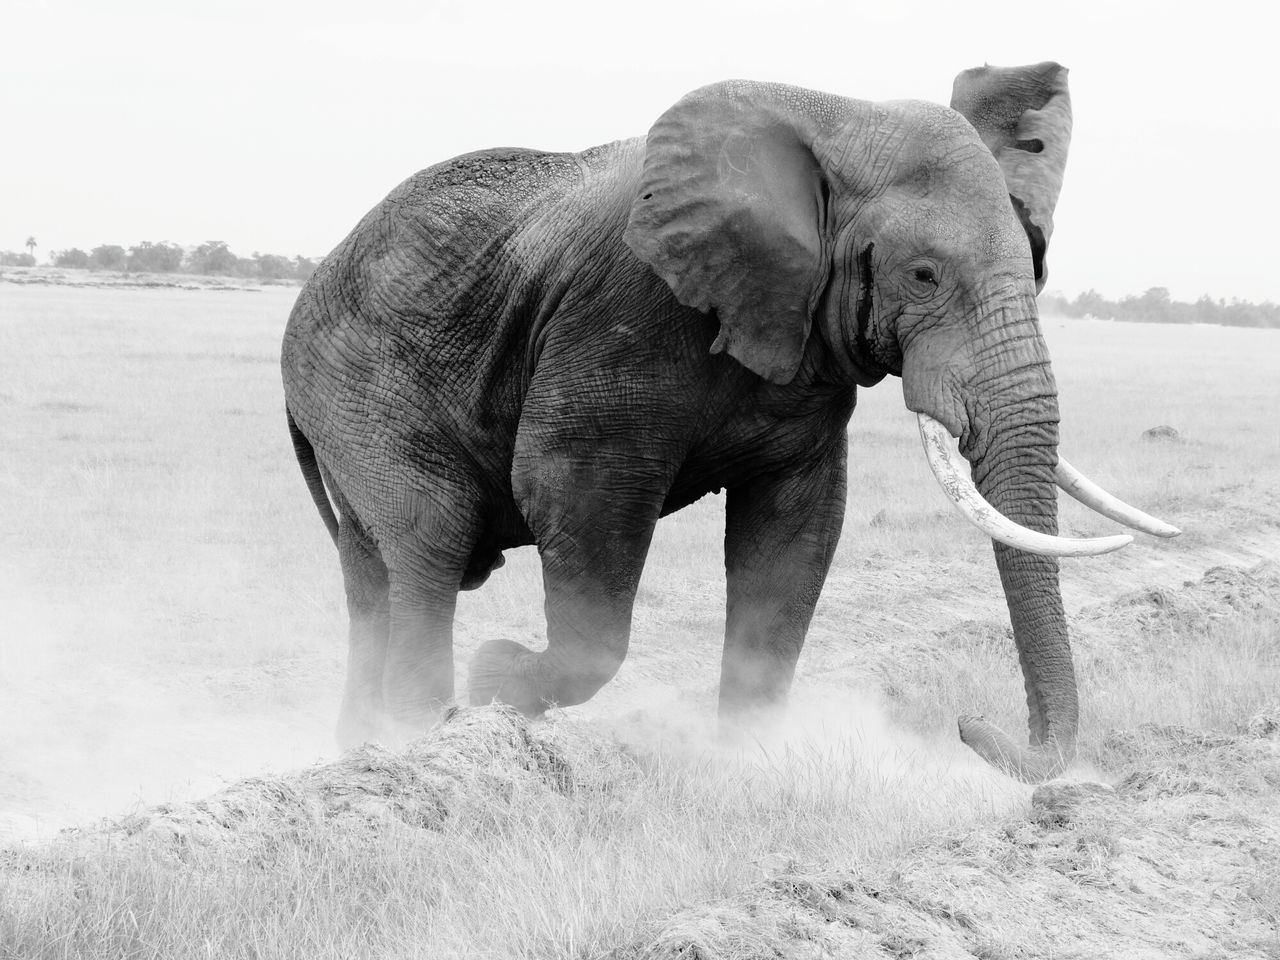 Safari Africa Share Your Adventure Animal_collection EyeEm Animal Lover Animal Portrait EyeEm Best Shots - Black + White Elephant Kenya Eye4black&white